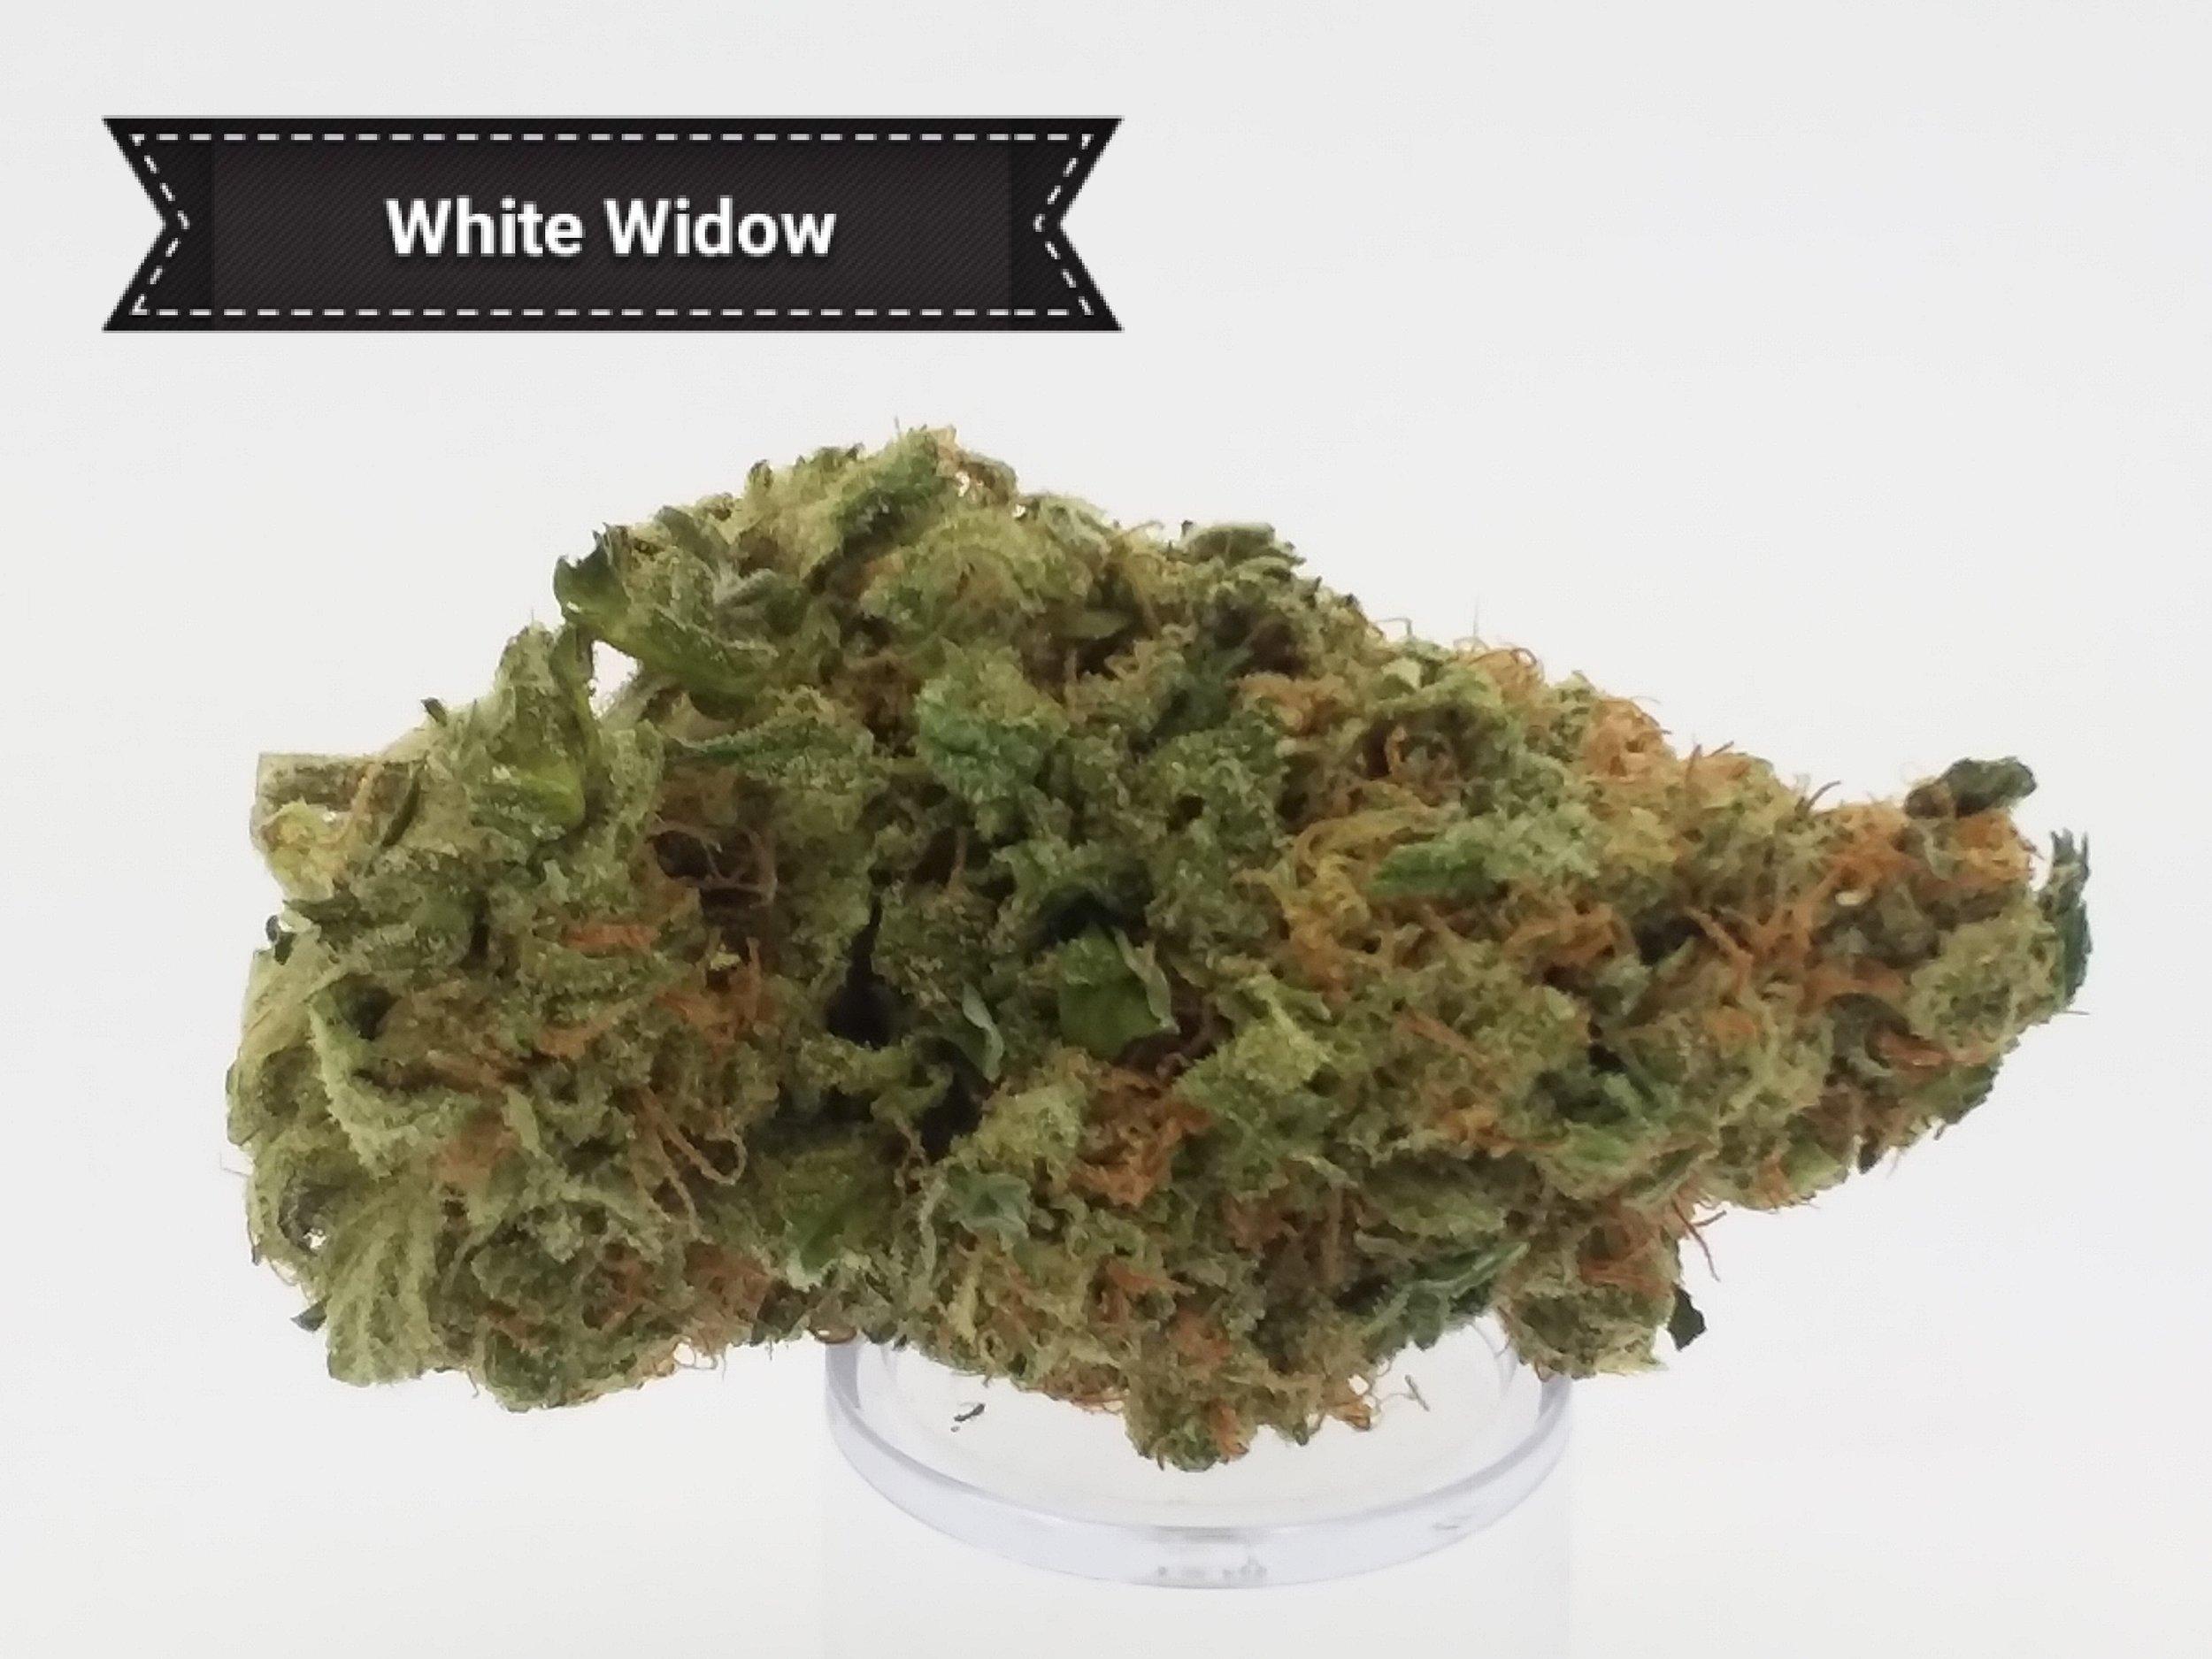 White-Wid.jpg